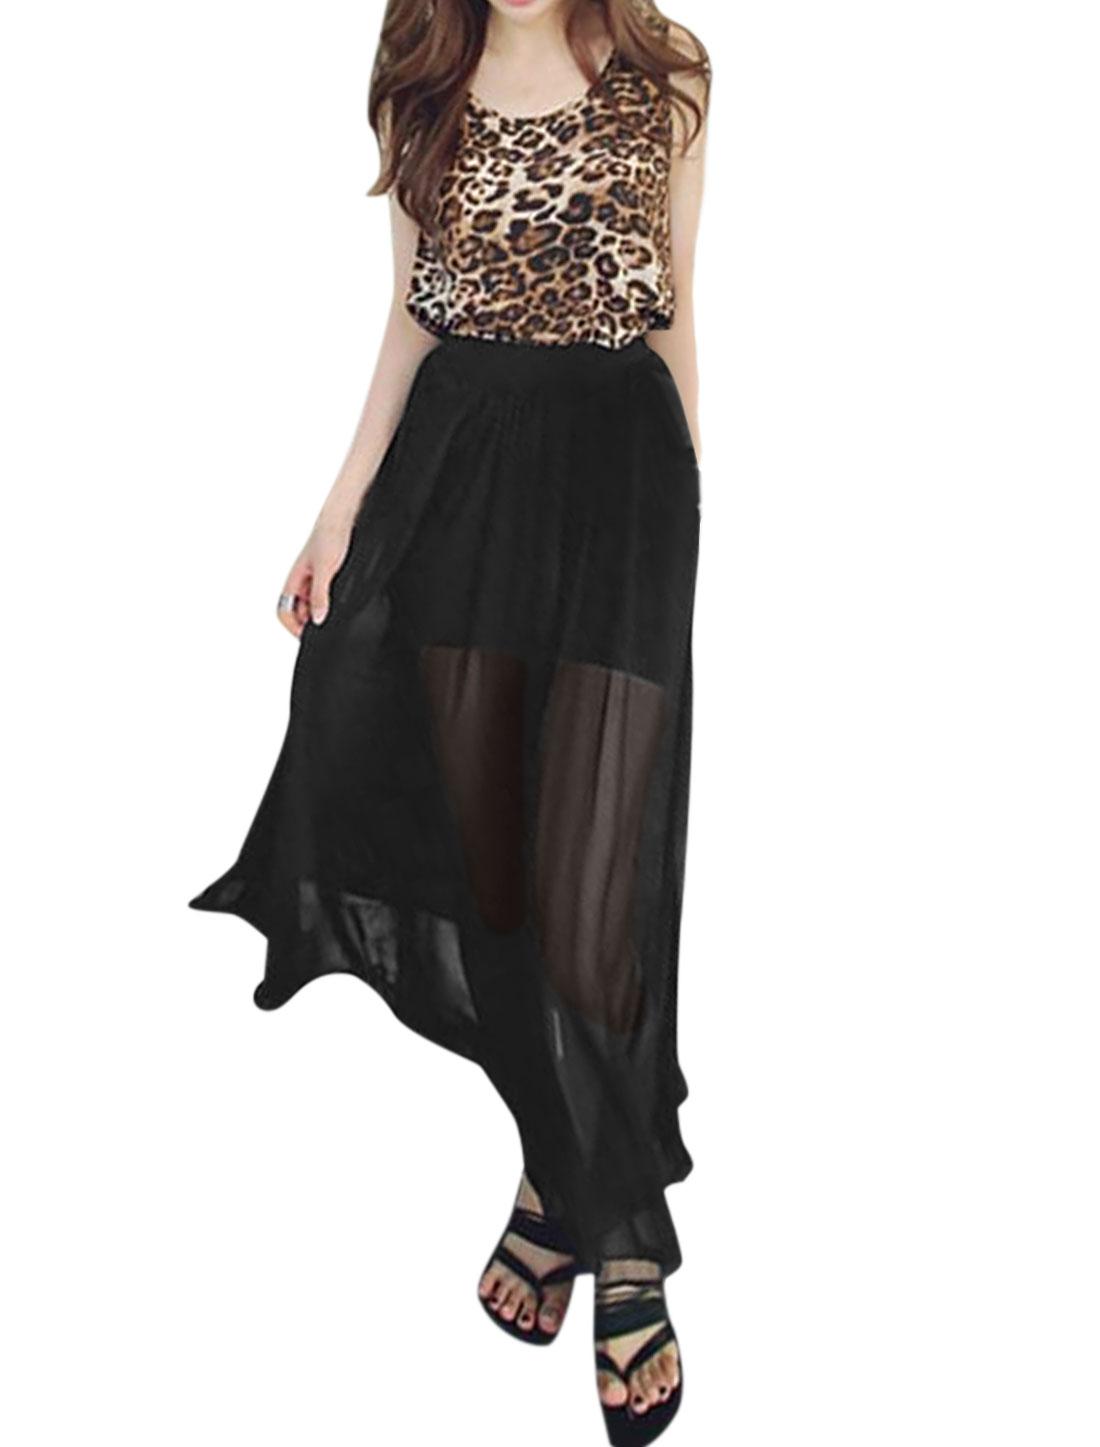 Women Leopard Prints Tank Top w Elastic Waist Chiffon Long Skirt Set Brown Black S